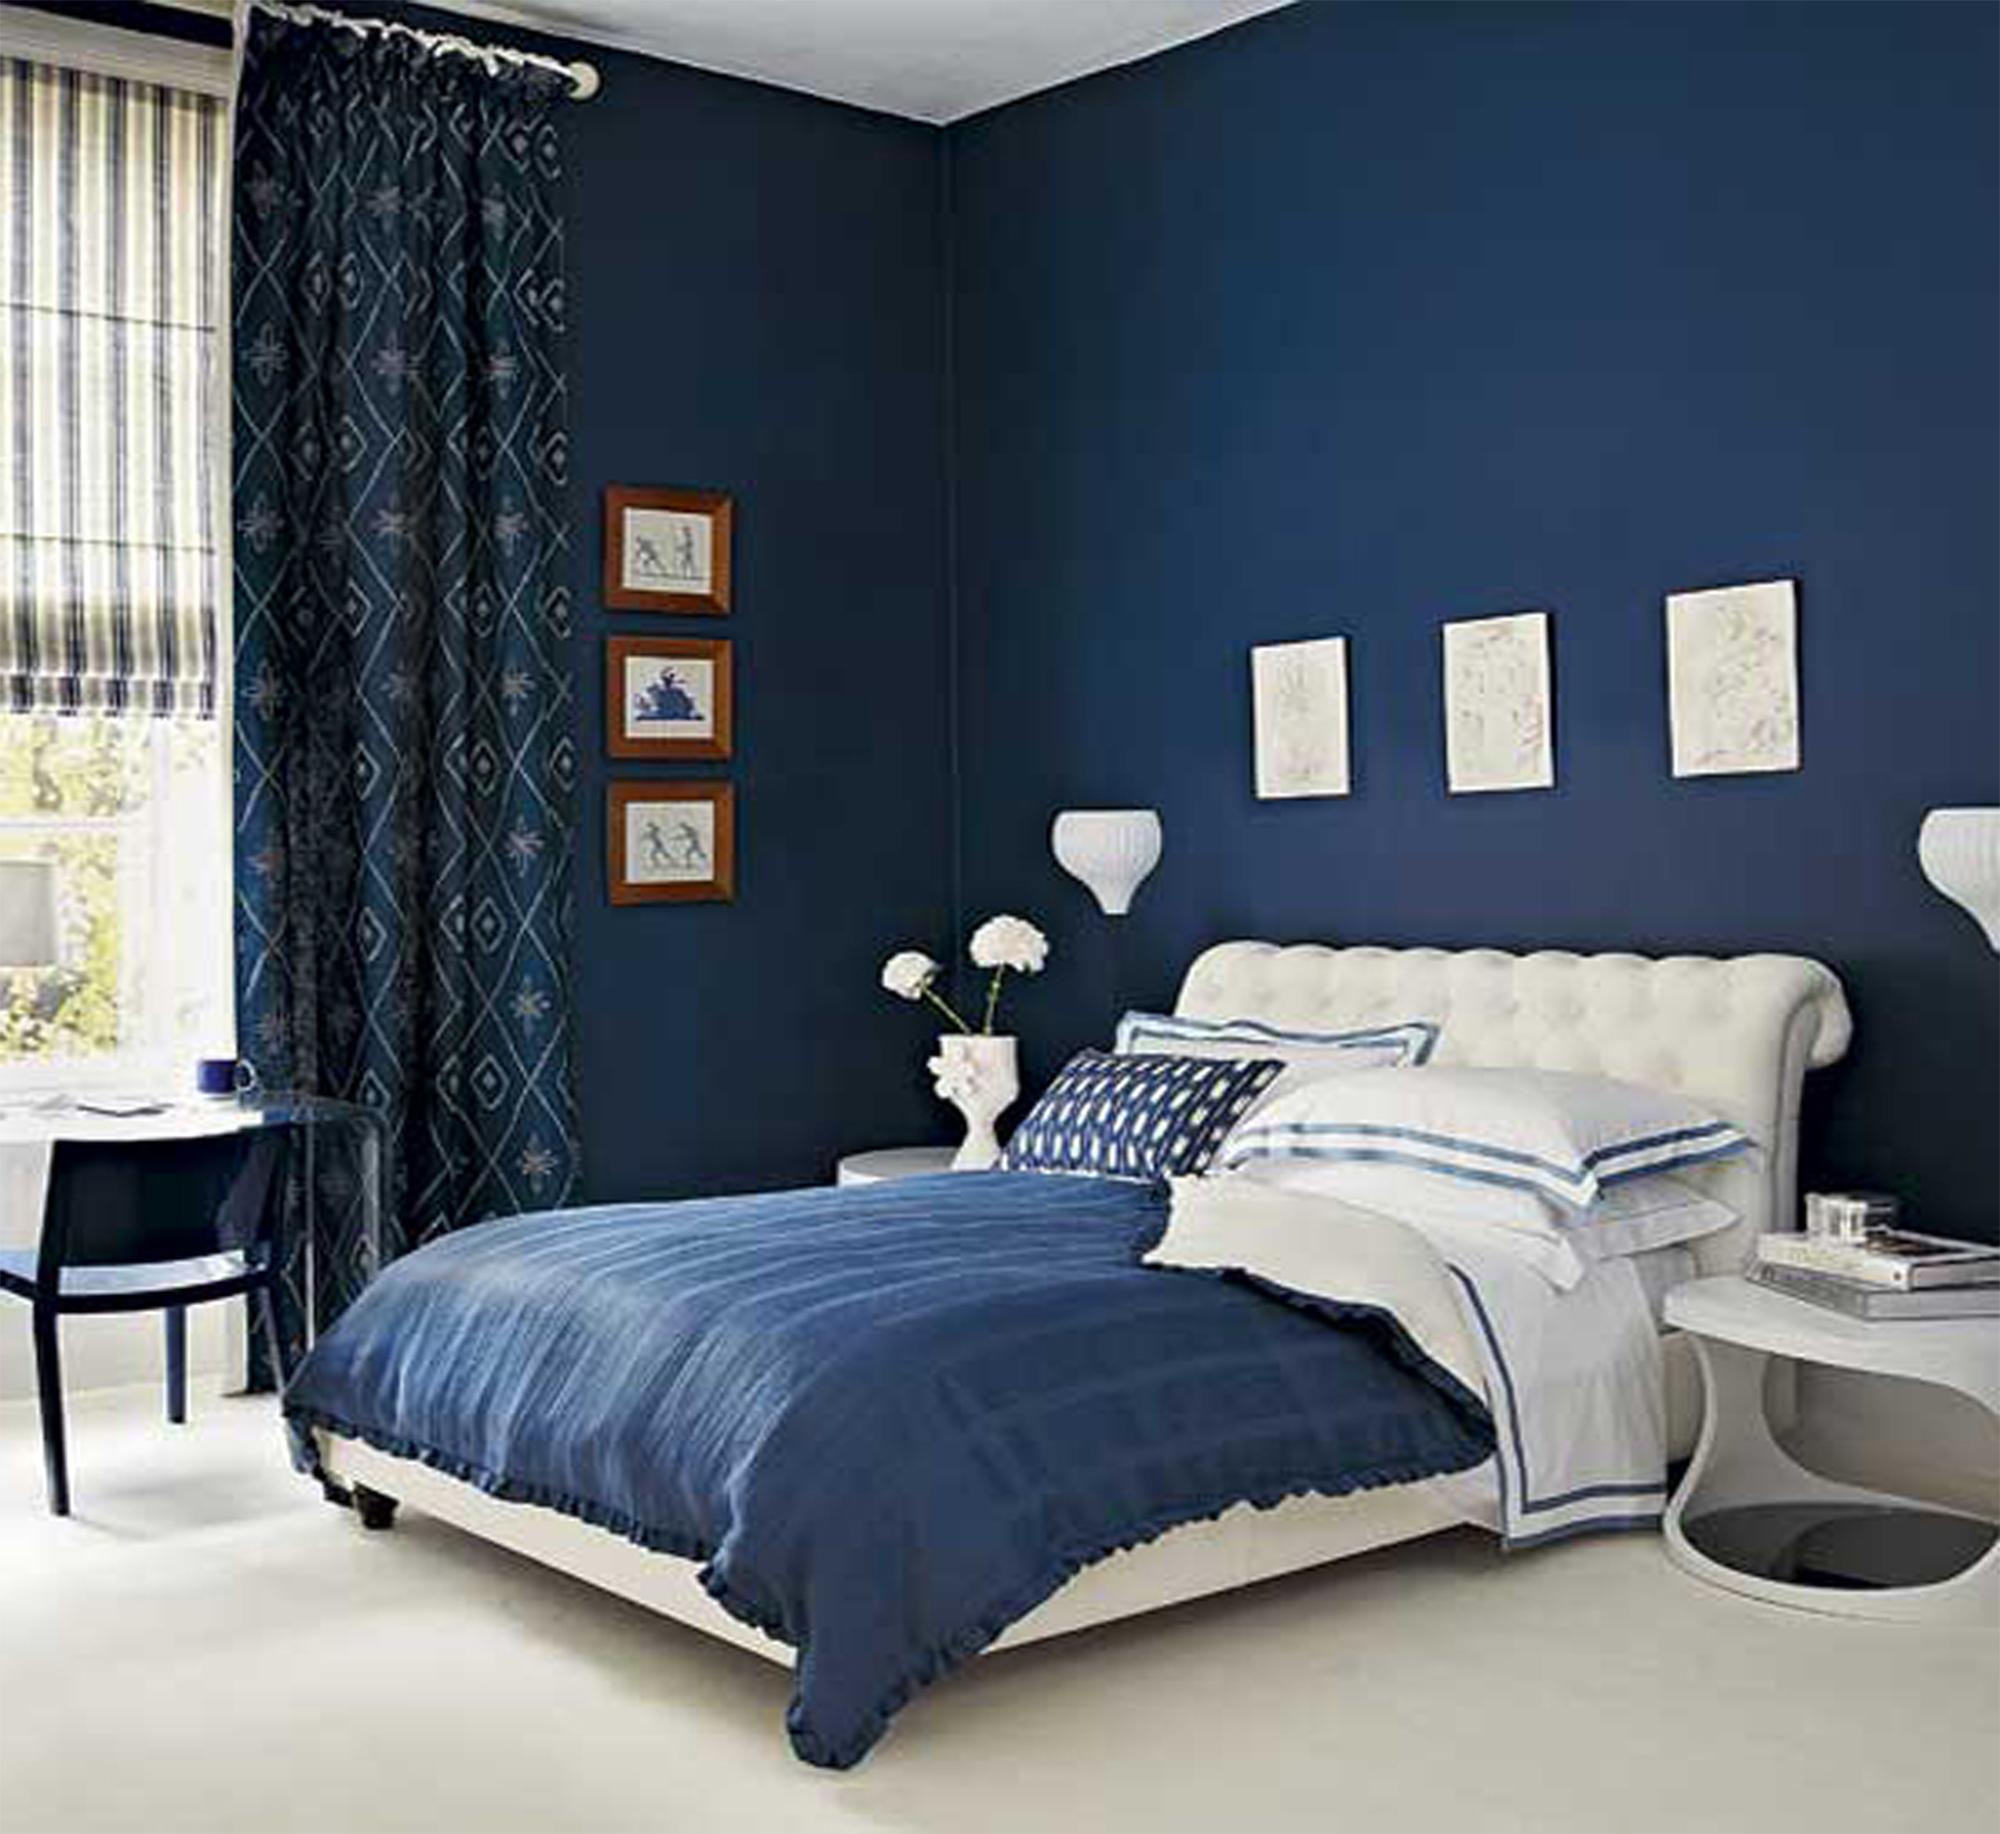 10 Amazing Black And Blue Bedroom Ideas amazing of navy blue and black bedroom ideas with blue be 3349 2020